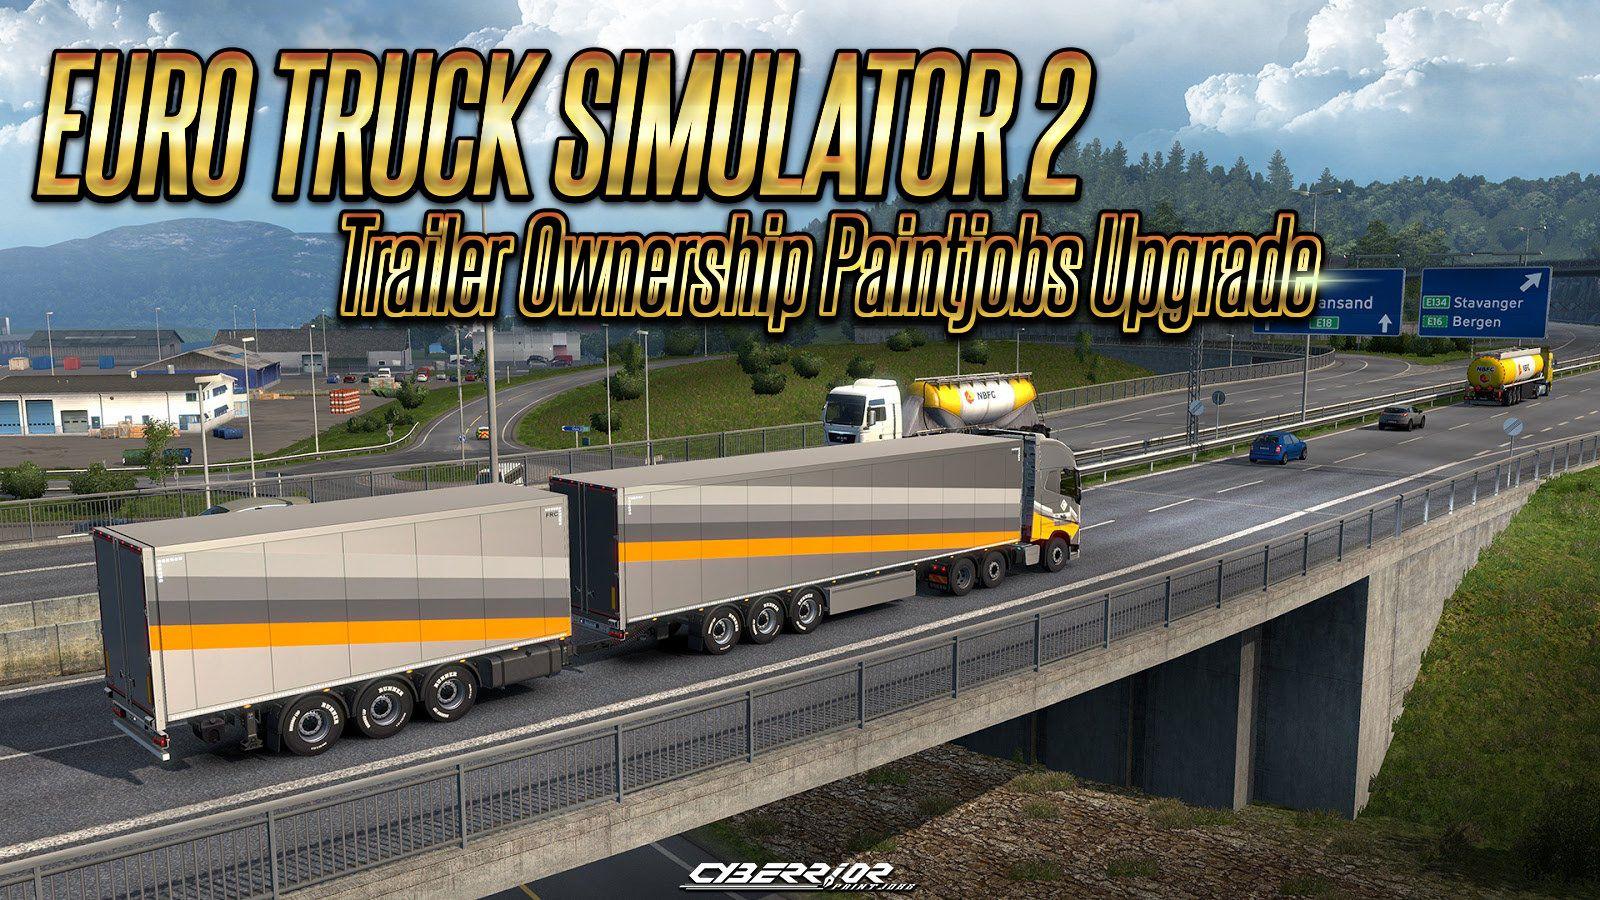 euro truck simulator 2 torrent download iso